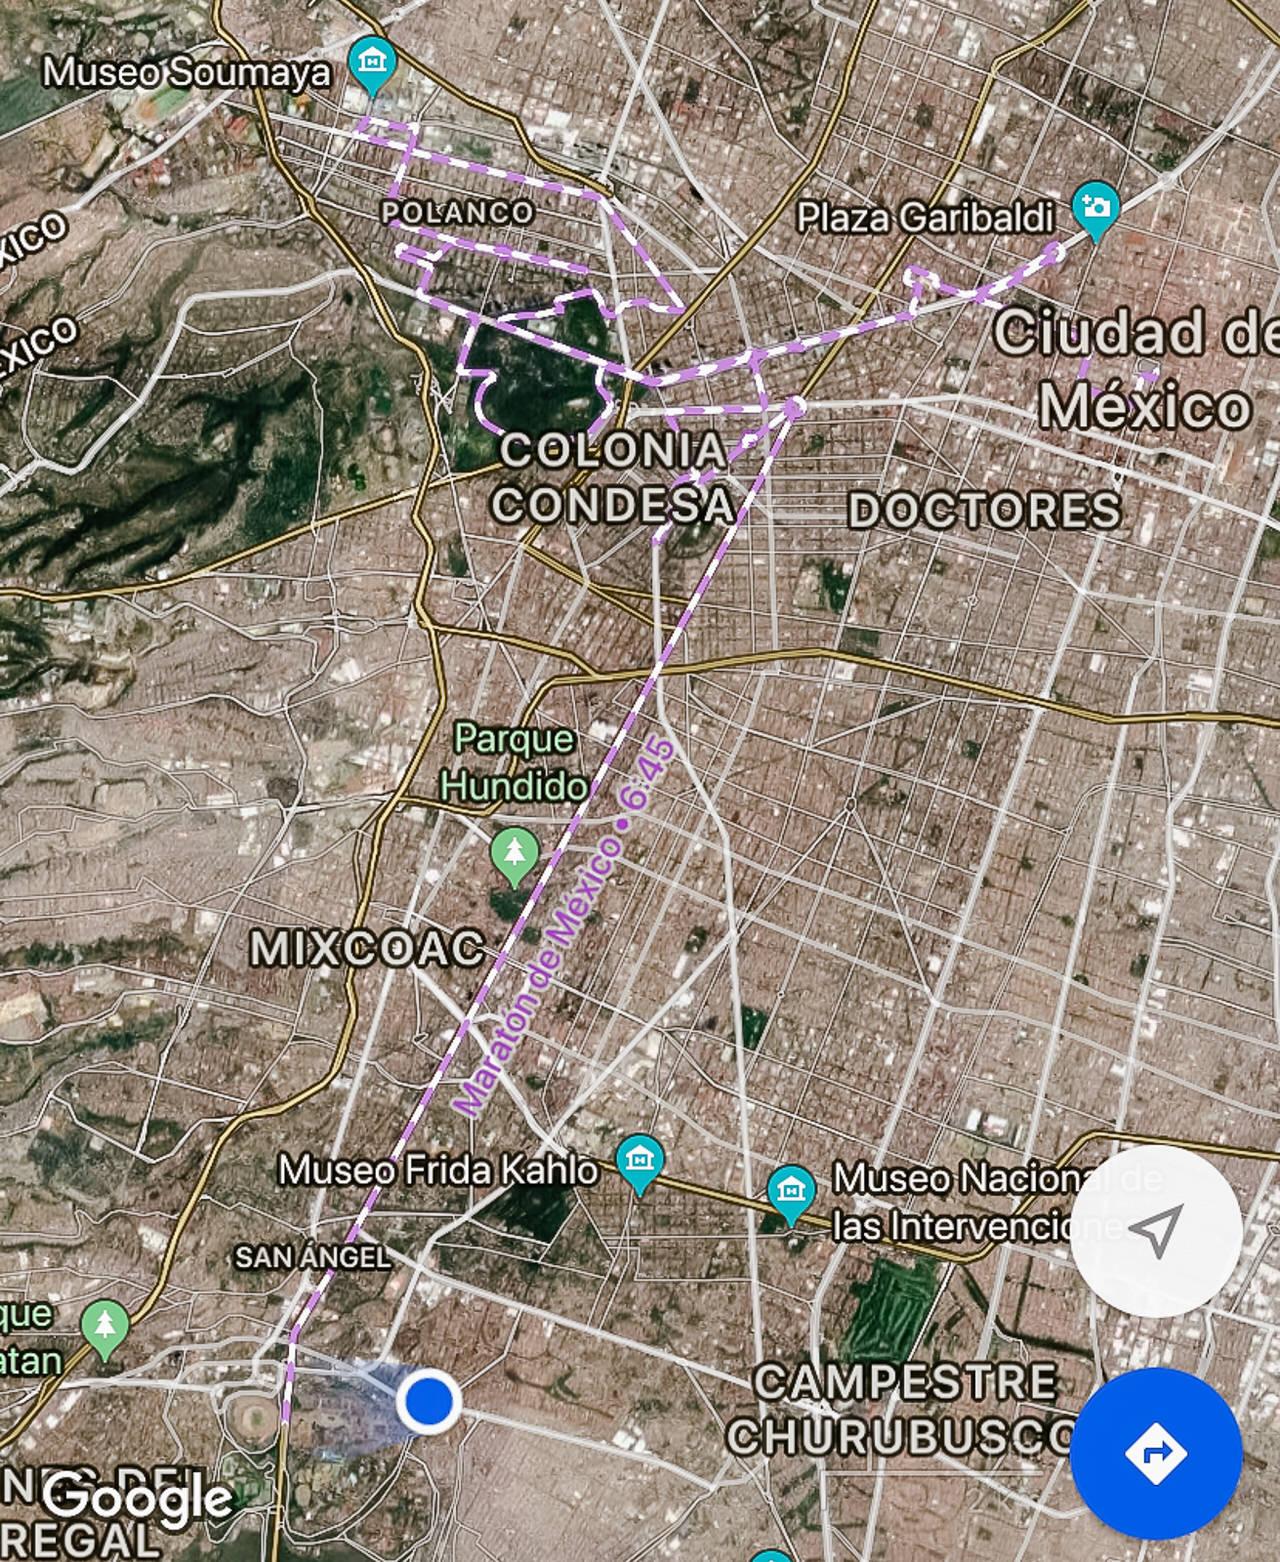 La ruta apareció en Google Maps desde un día antes de la carrera!